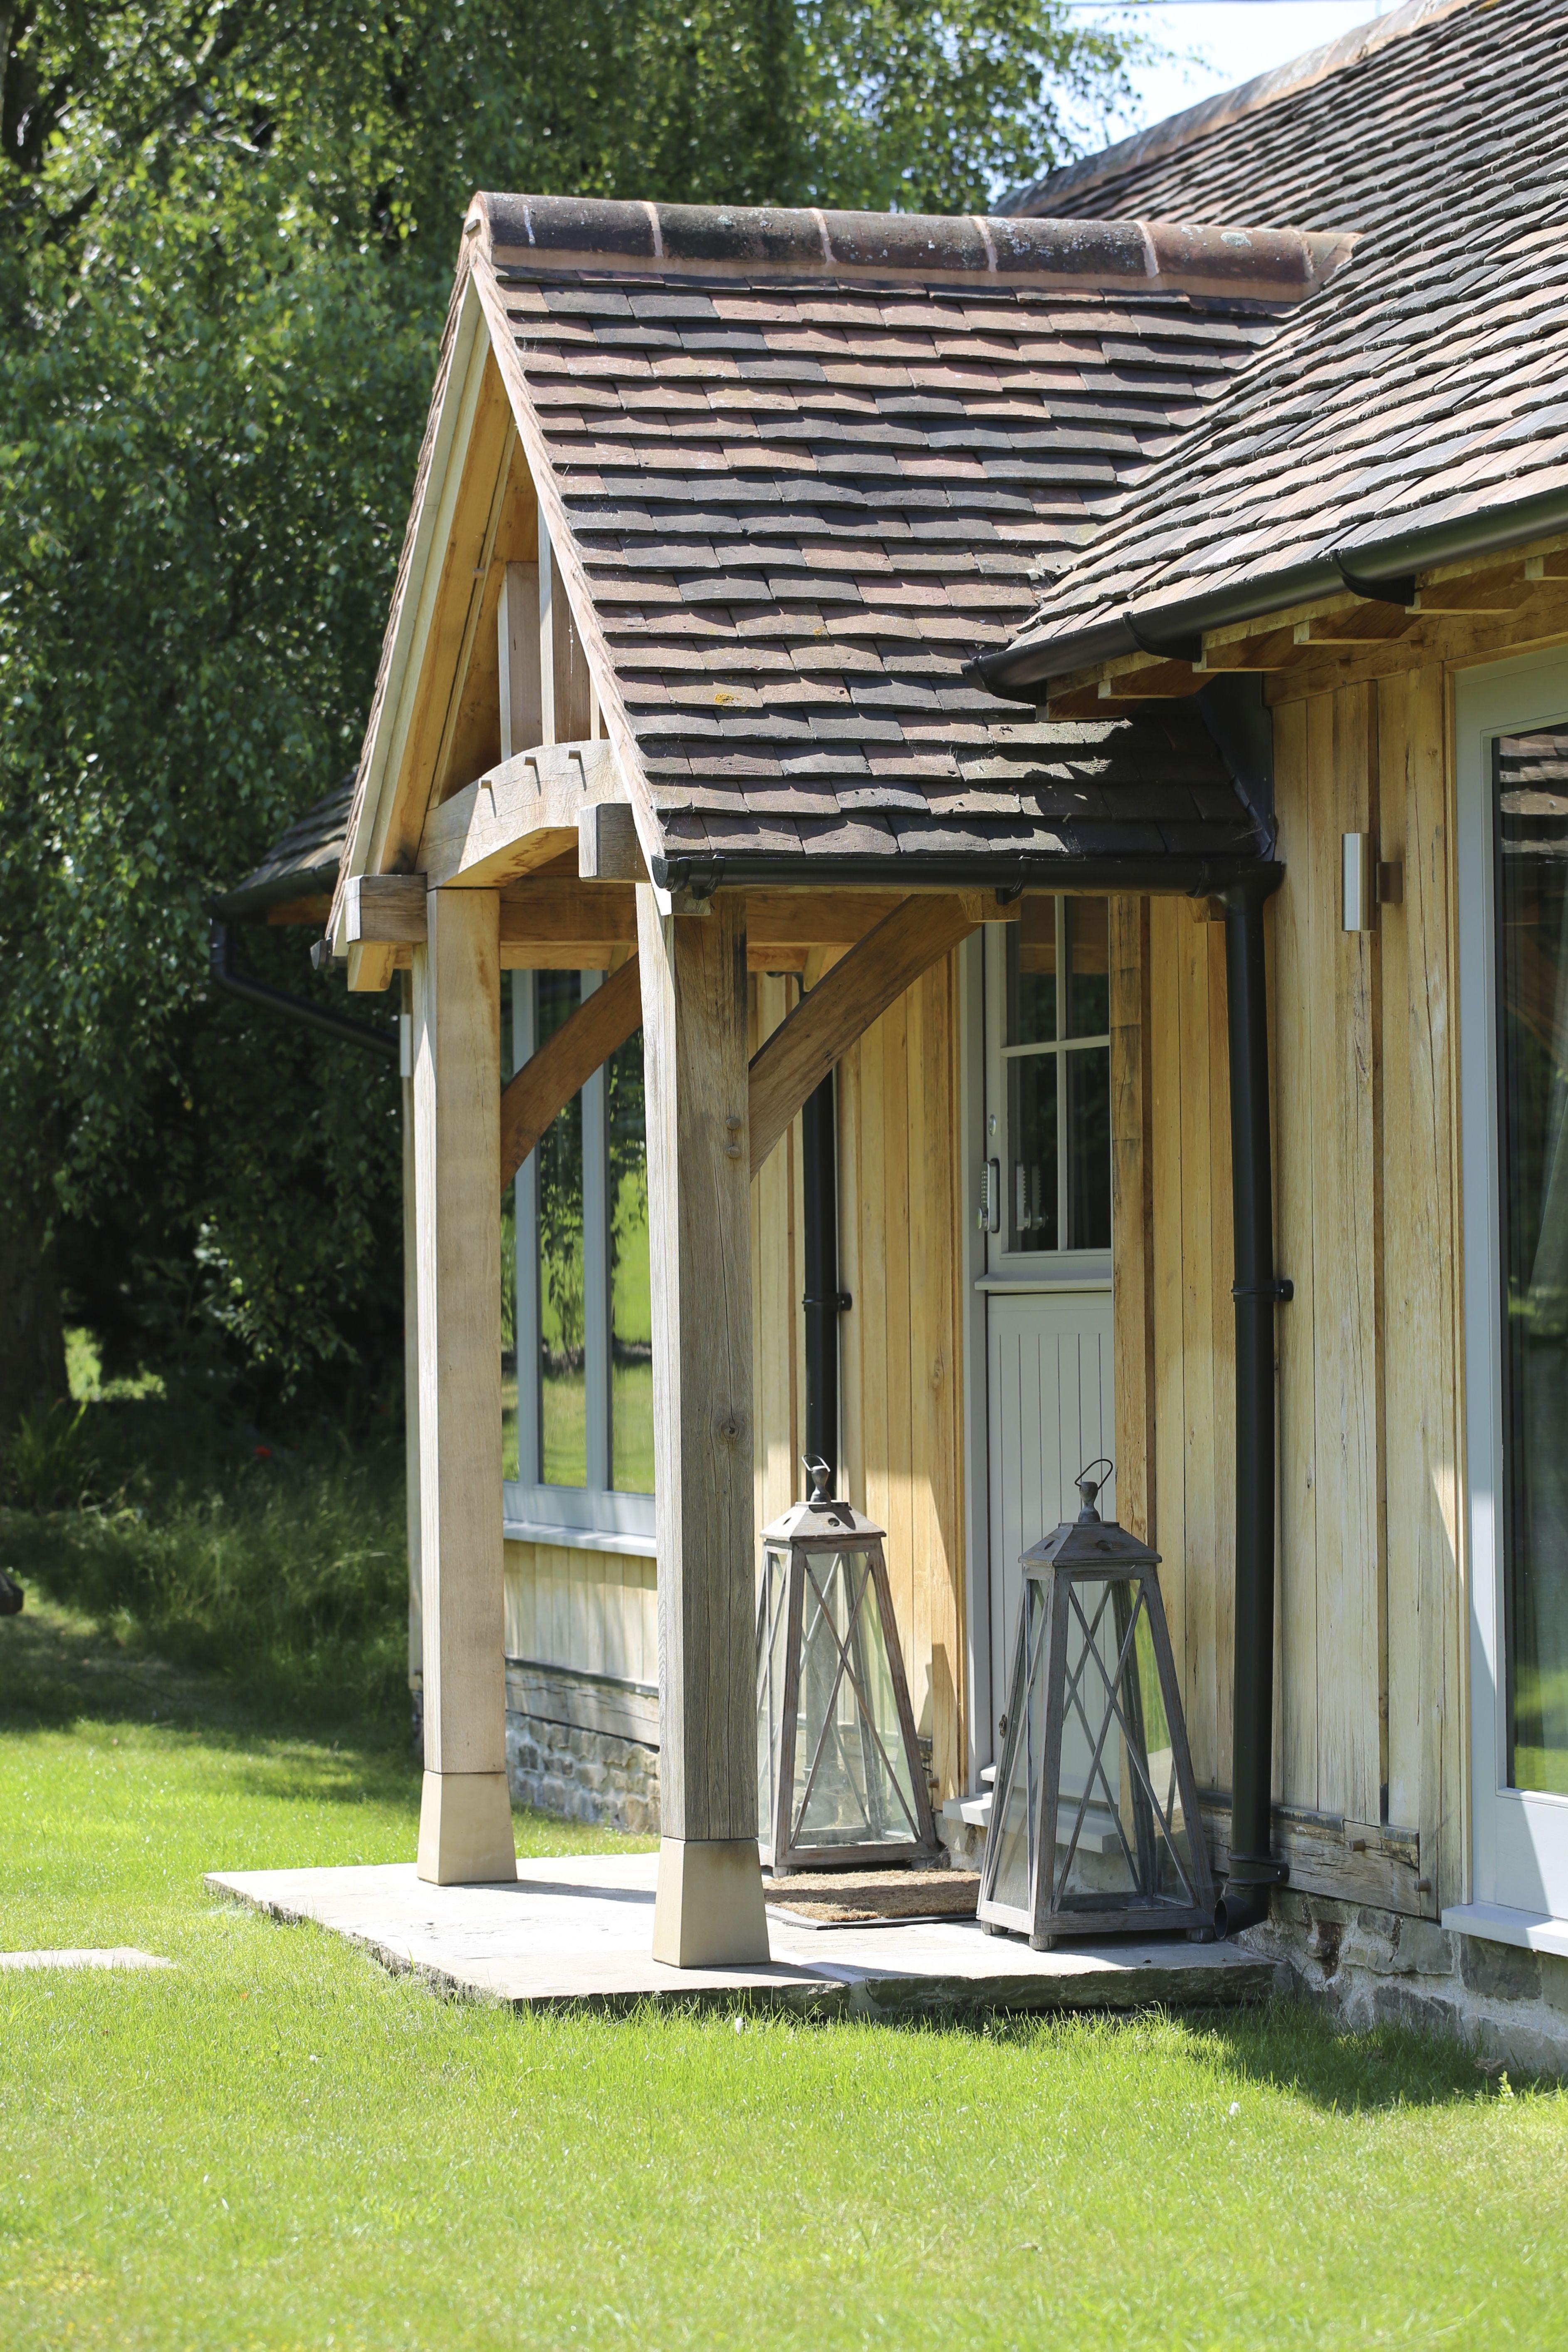 Stunning Oak framed porch on the front